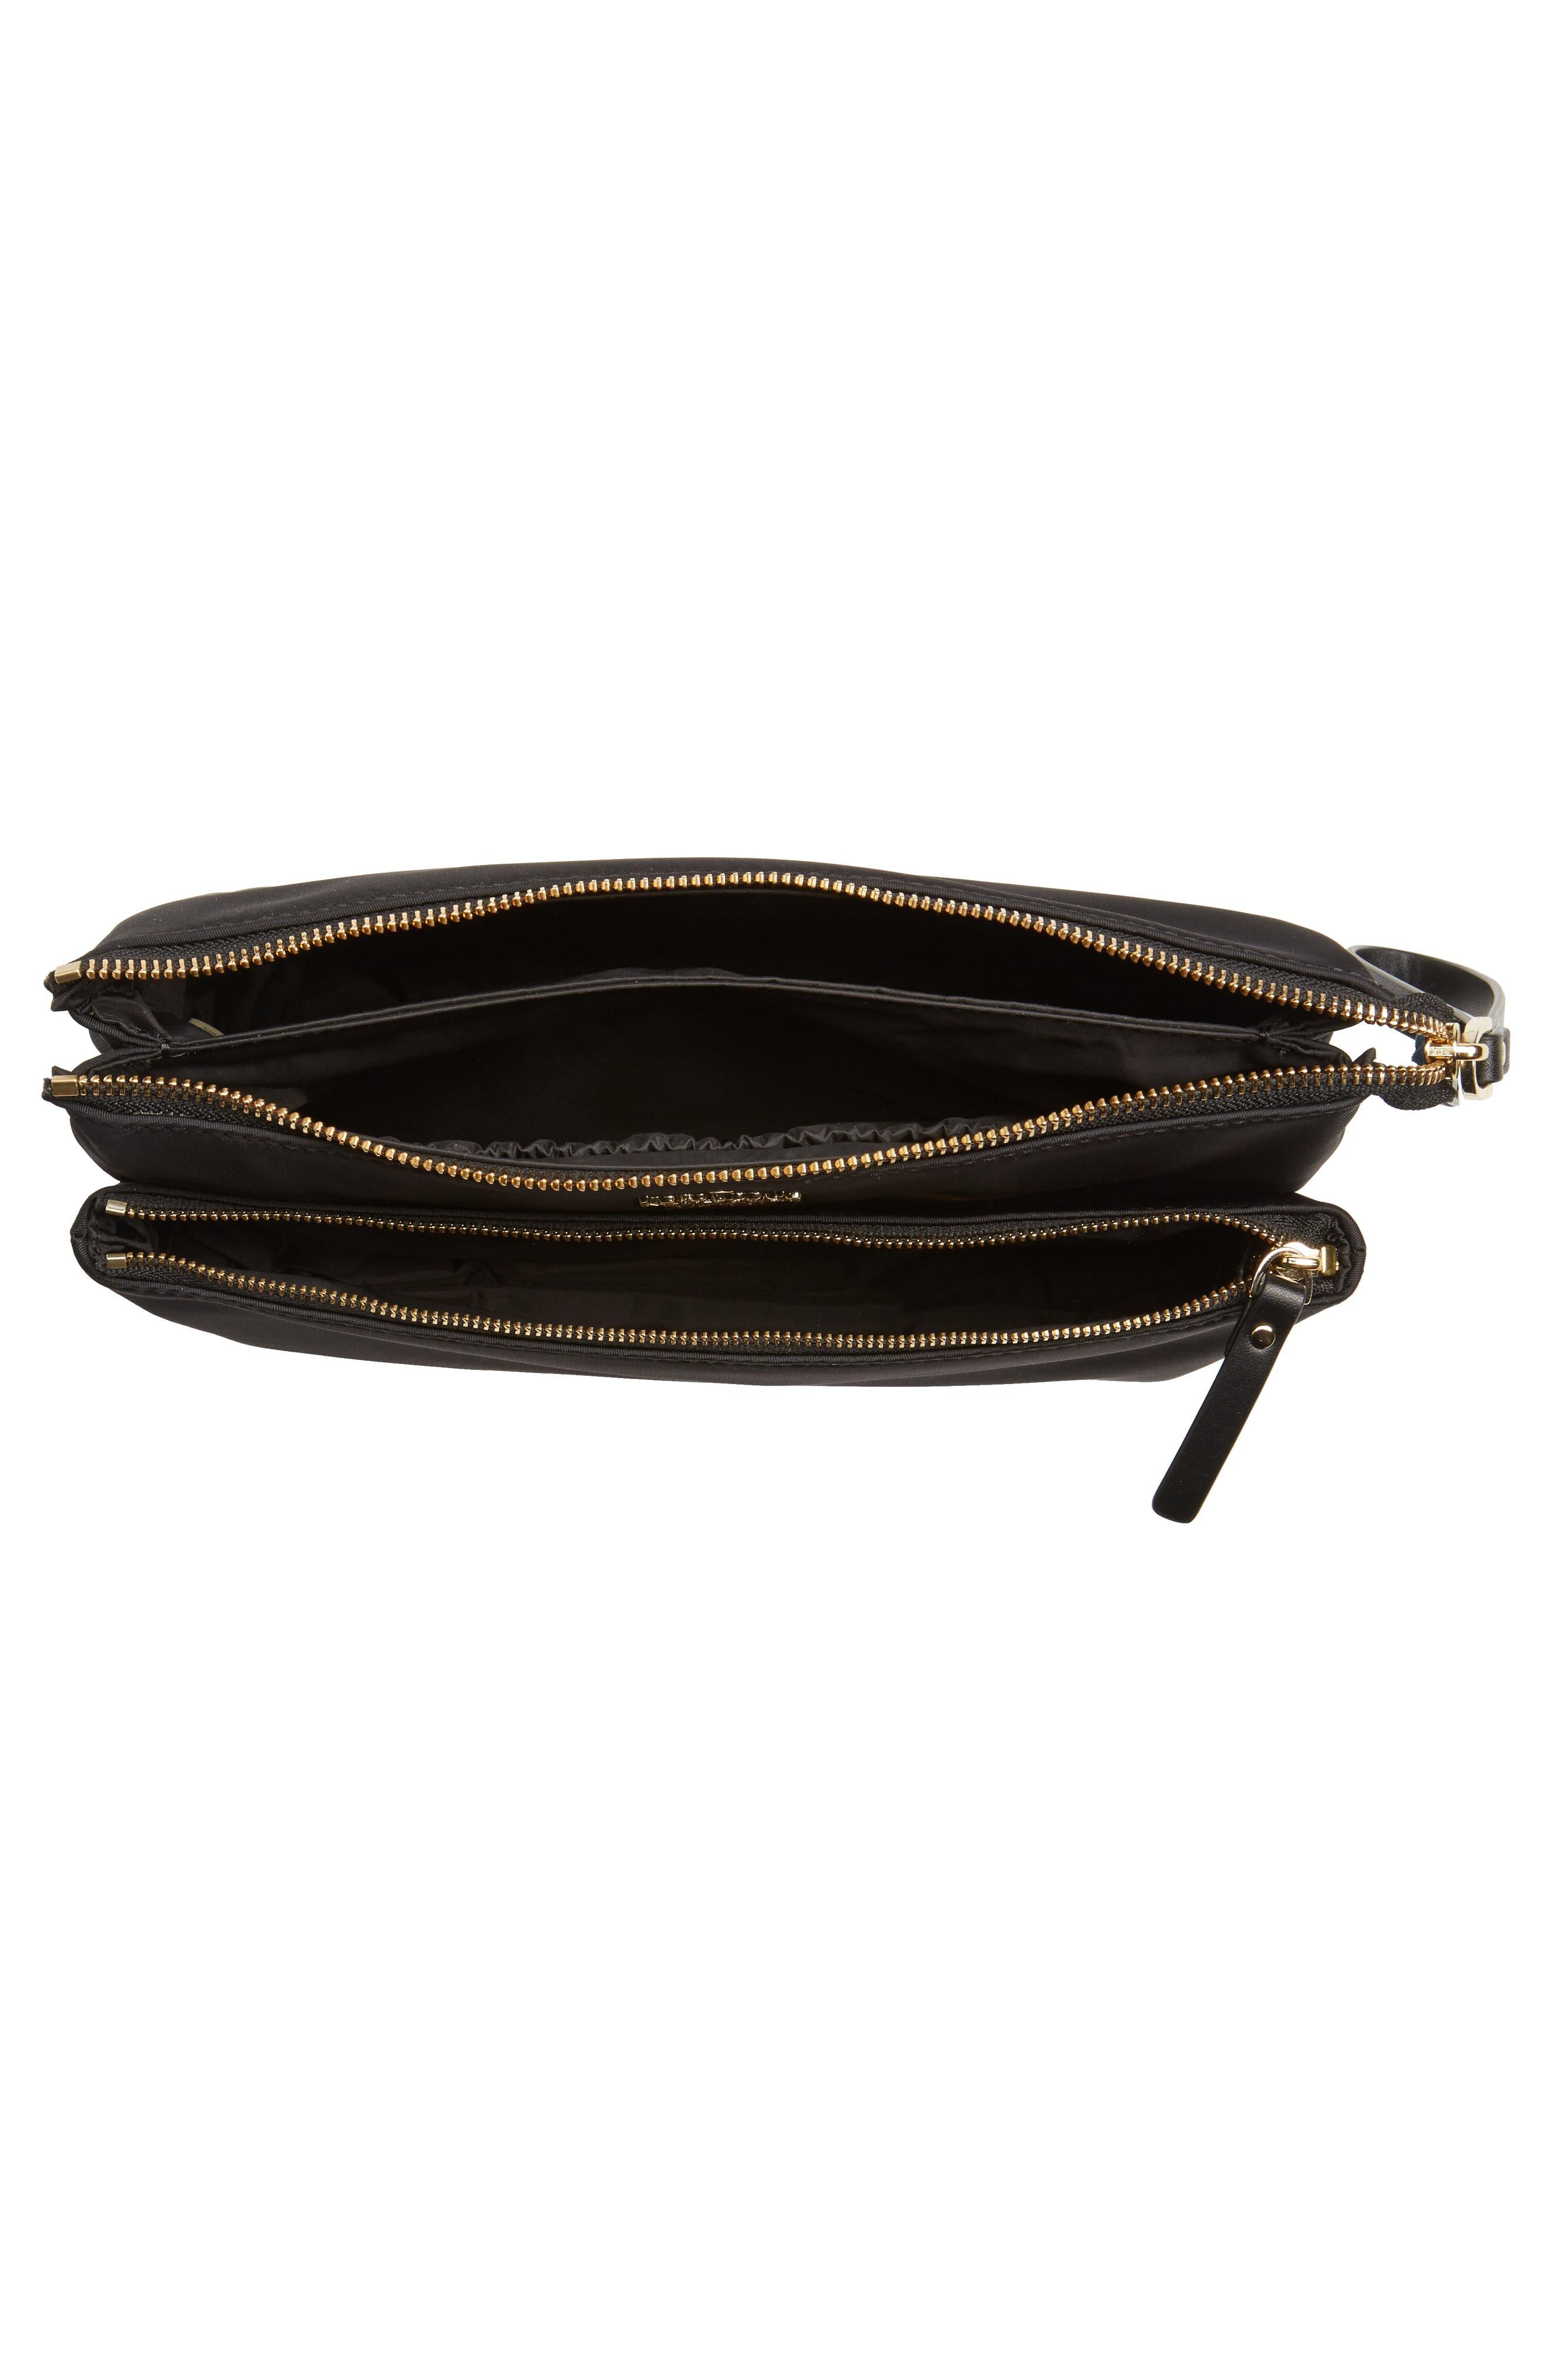 watson lane winnie baby nylon pouch with changing mat,                             Alternate thumbnail 4, color,                             Black